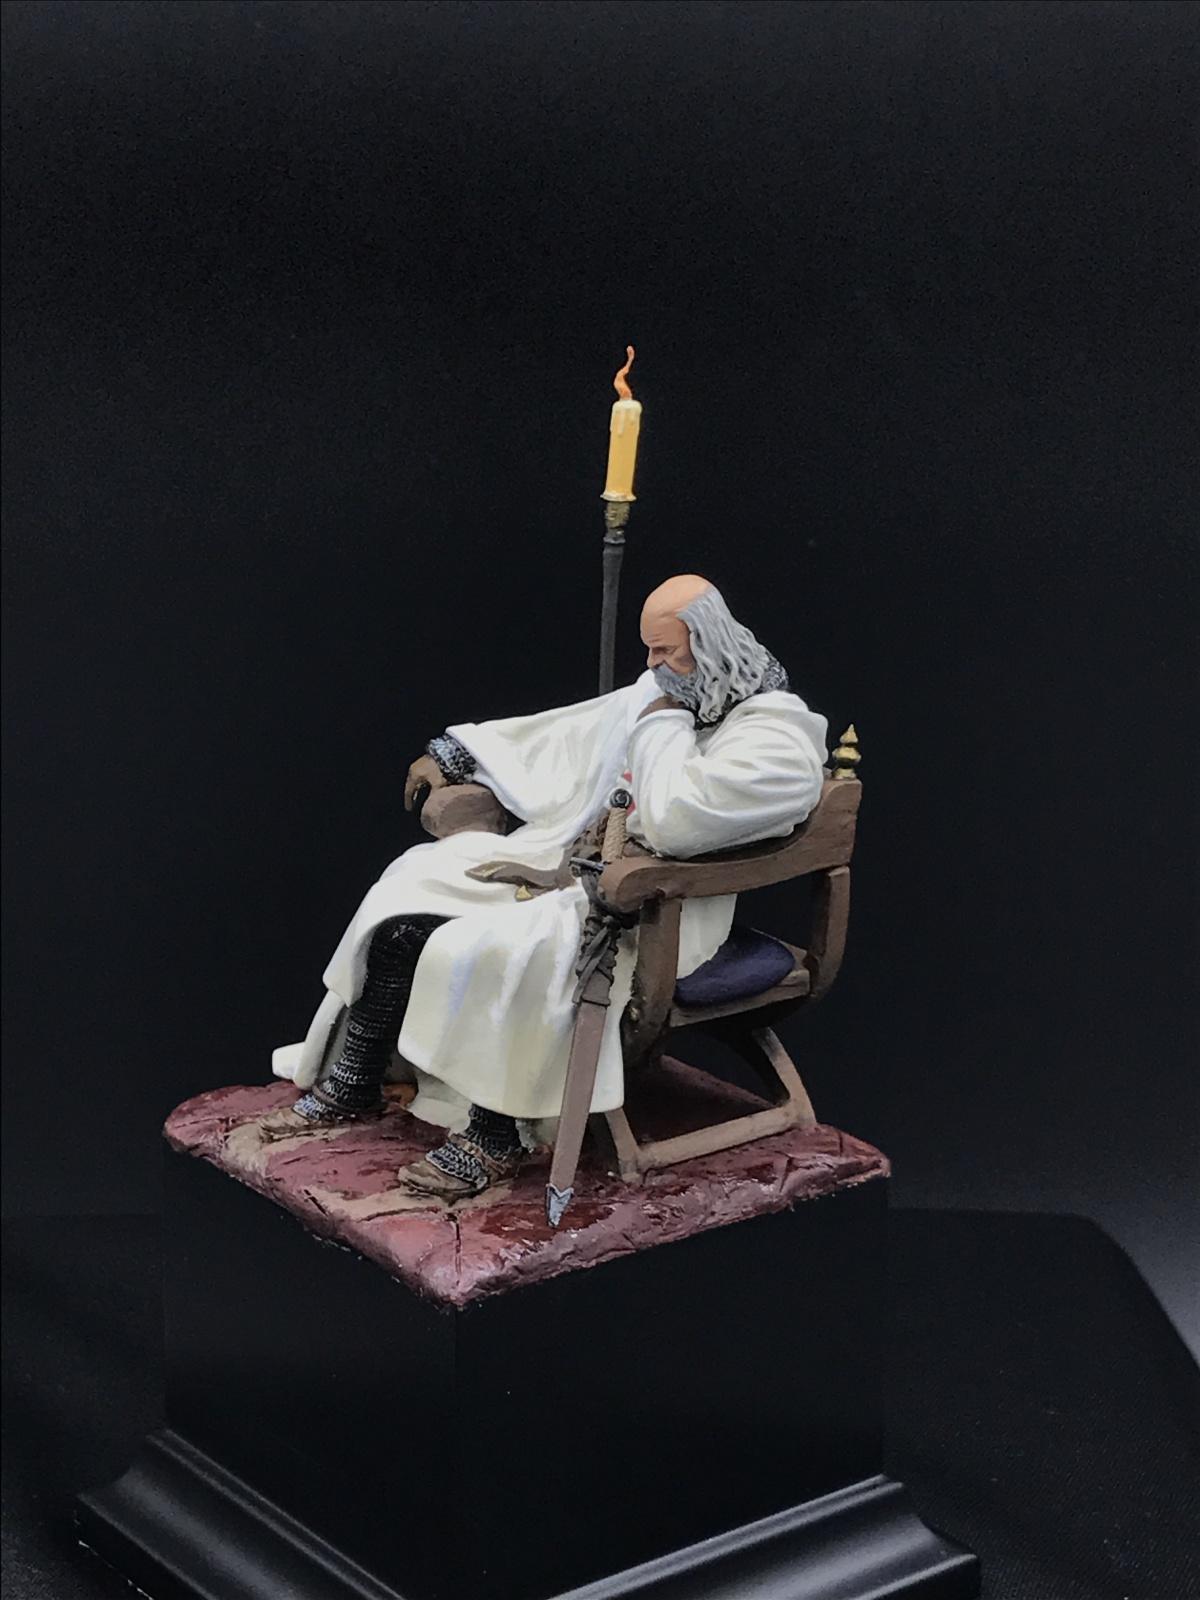 Jacques de Molay Grand Master The Last Knight Crusader